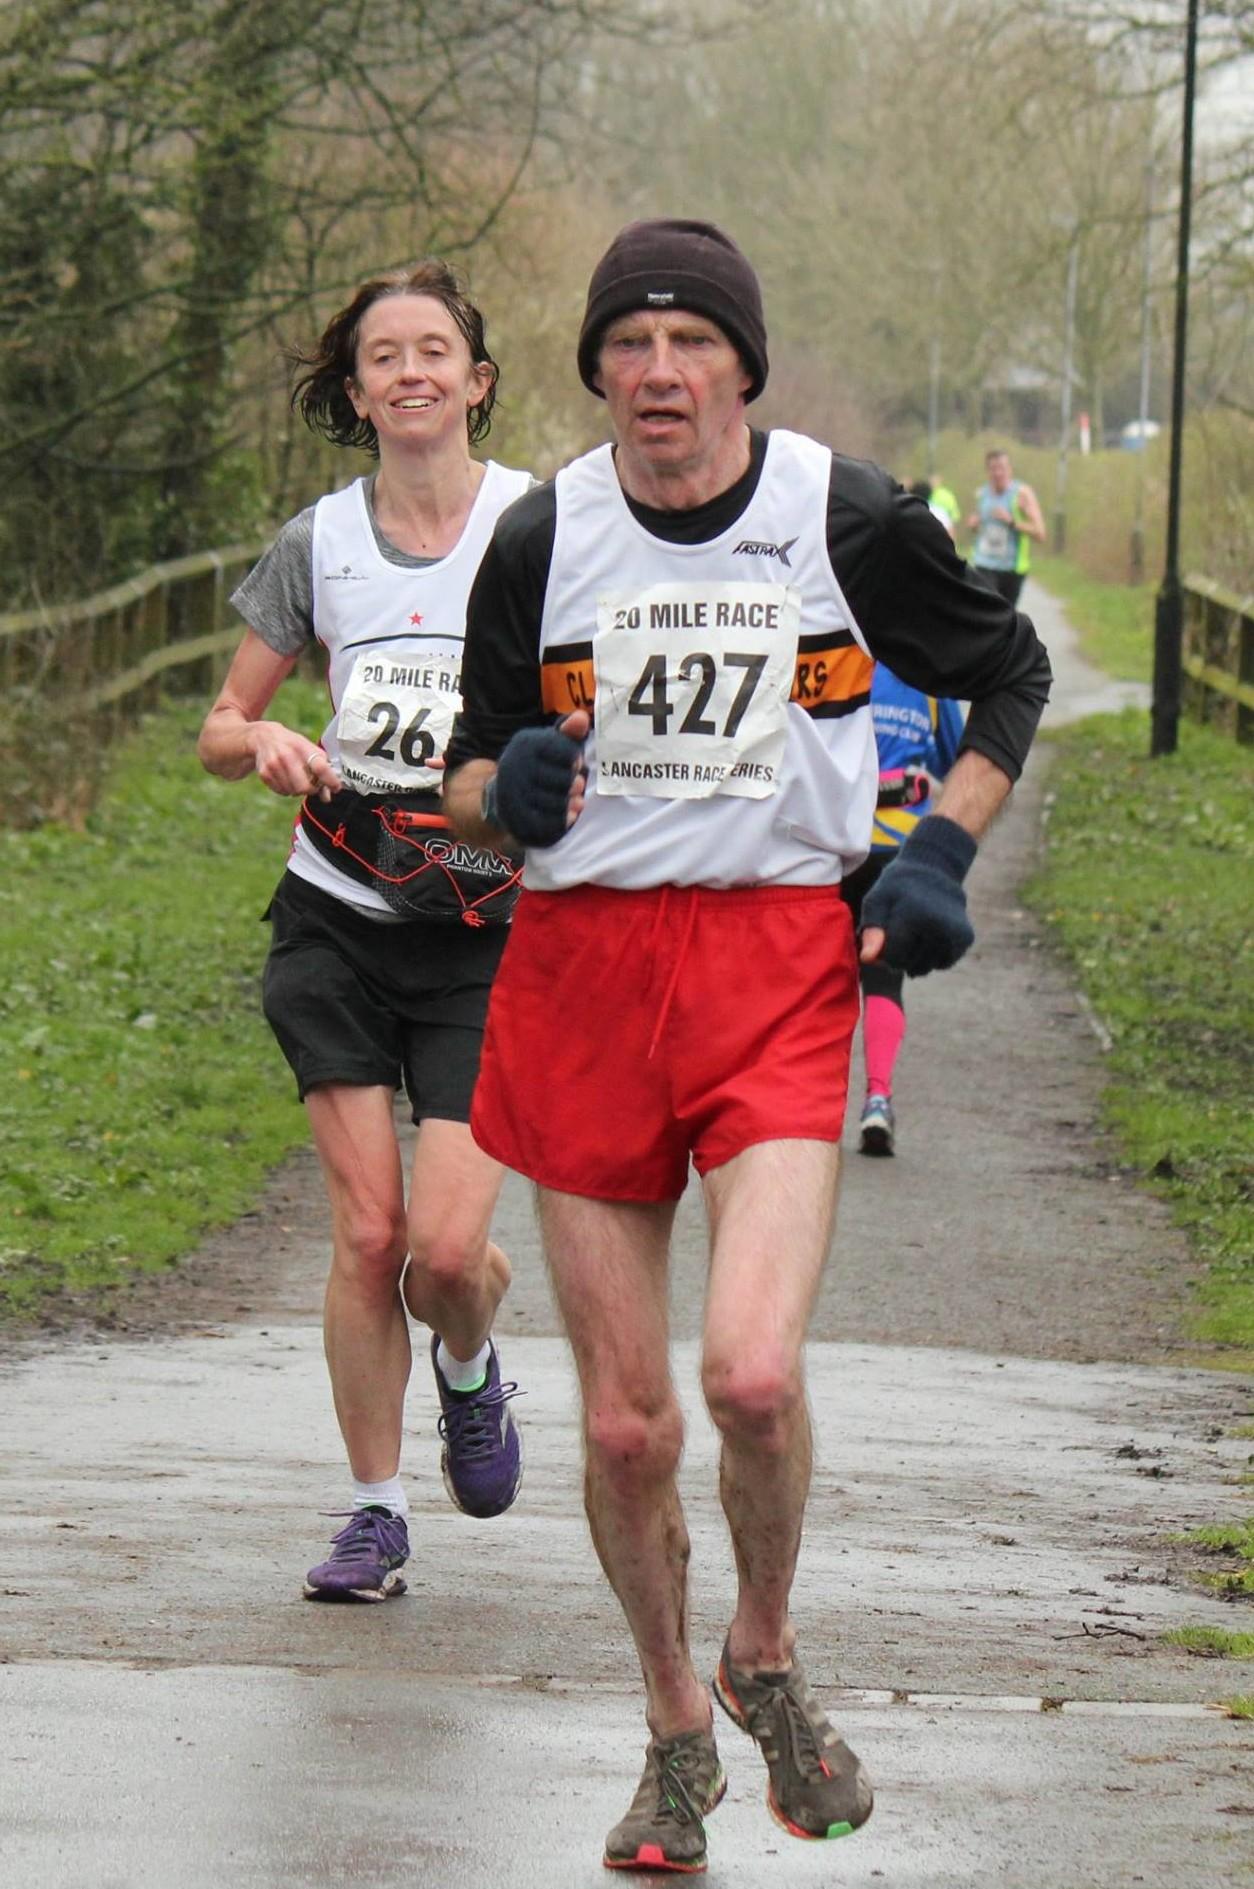 John Hartley at the Trimpell 20